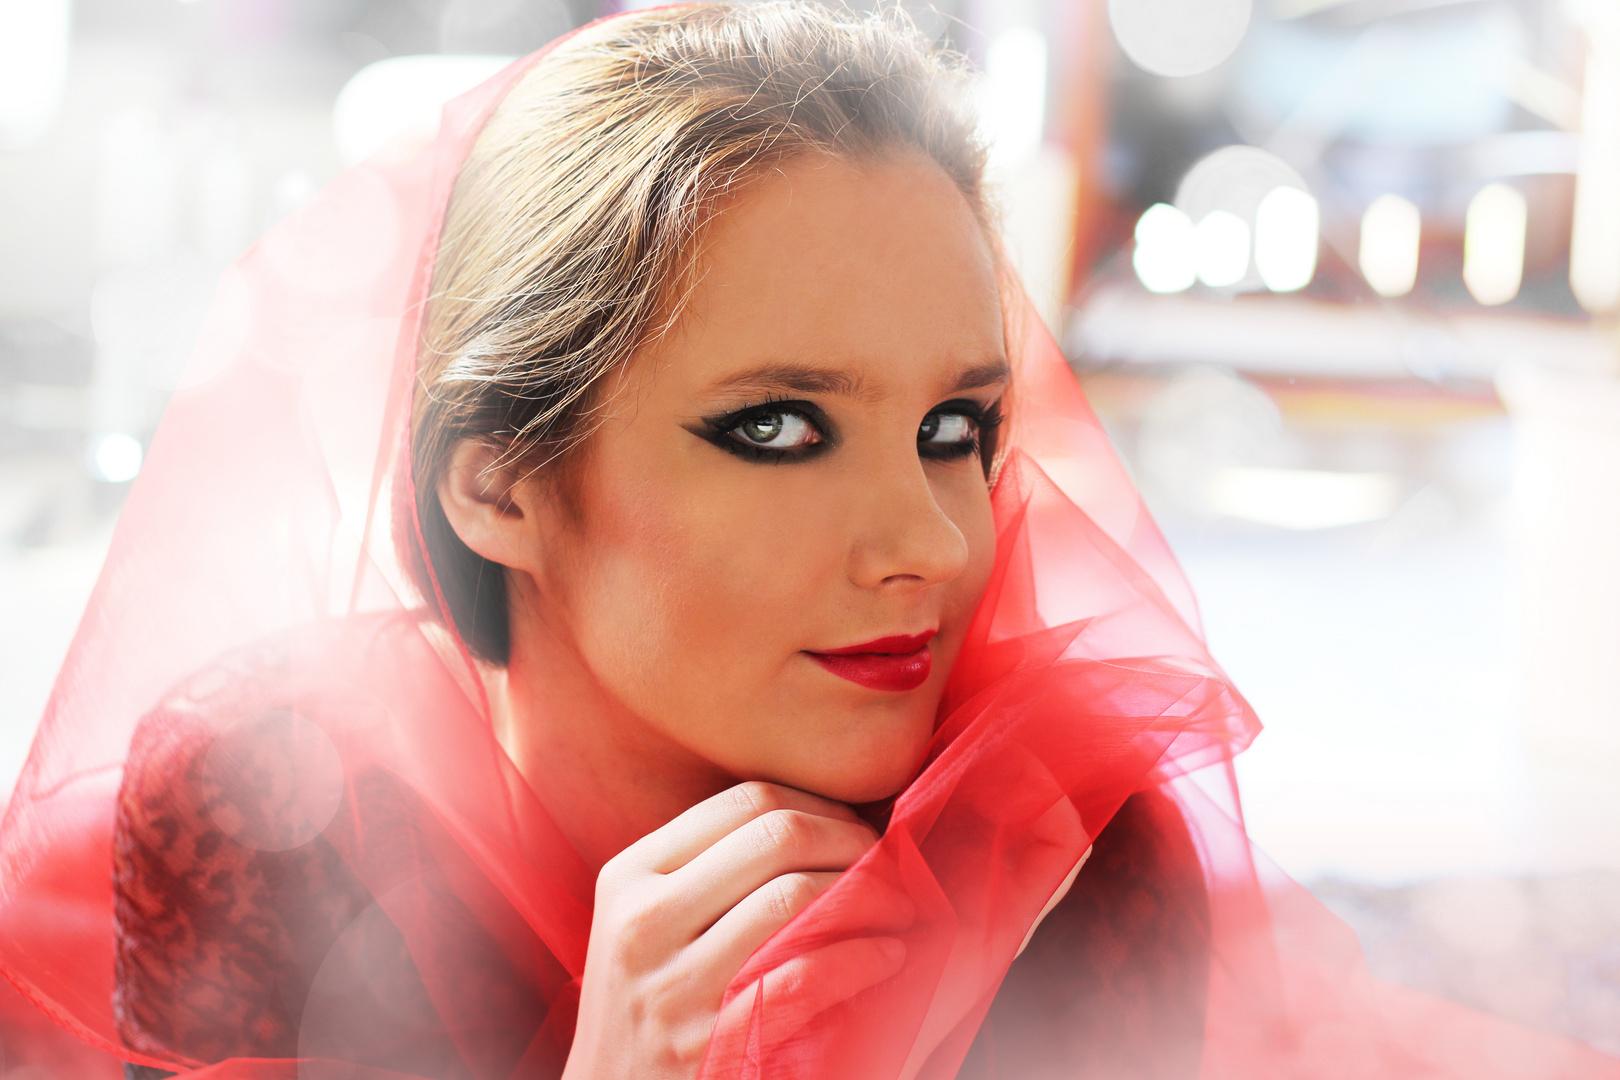 Red Dreams // Model Doreen Bassing